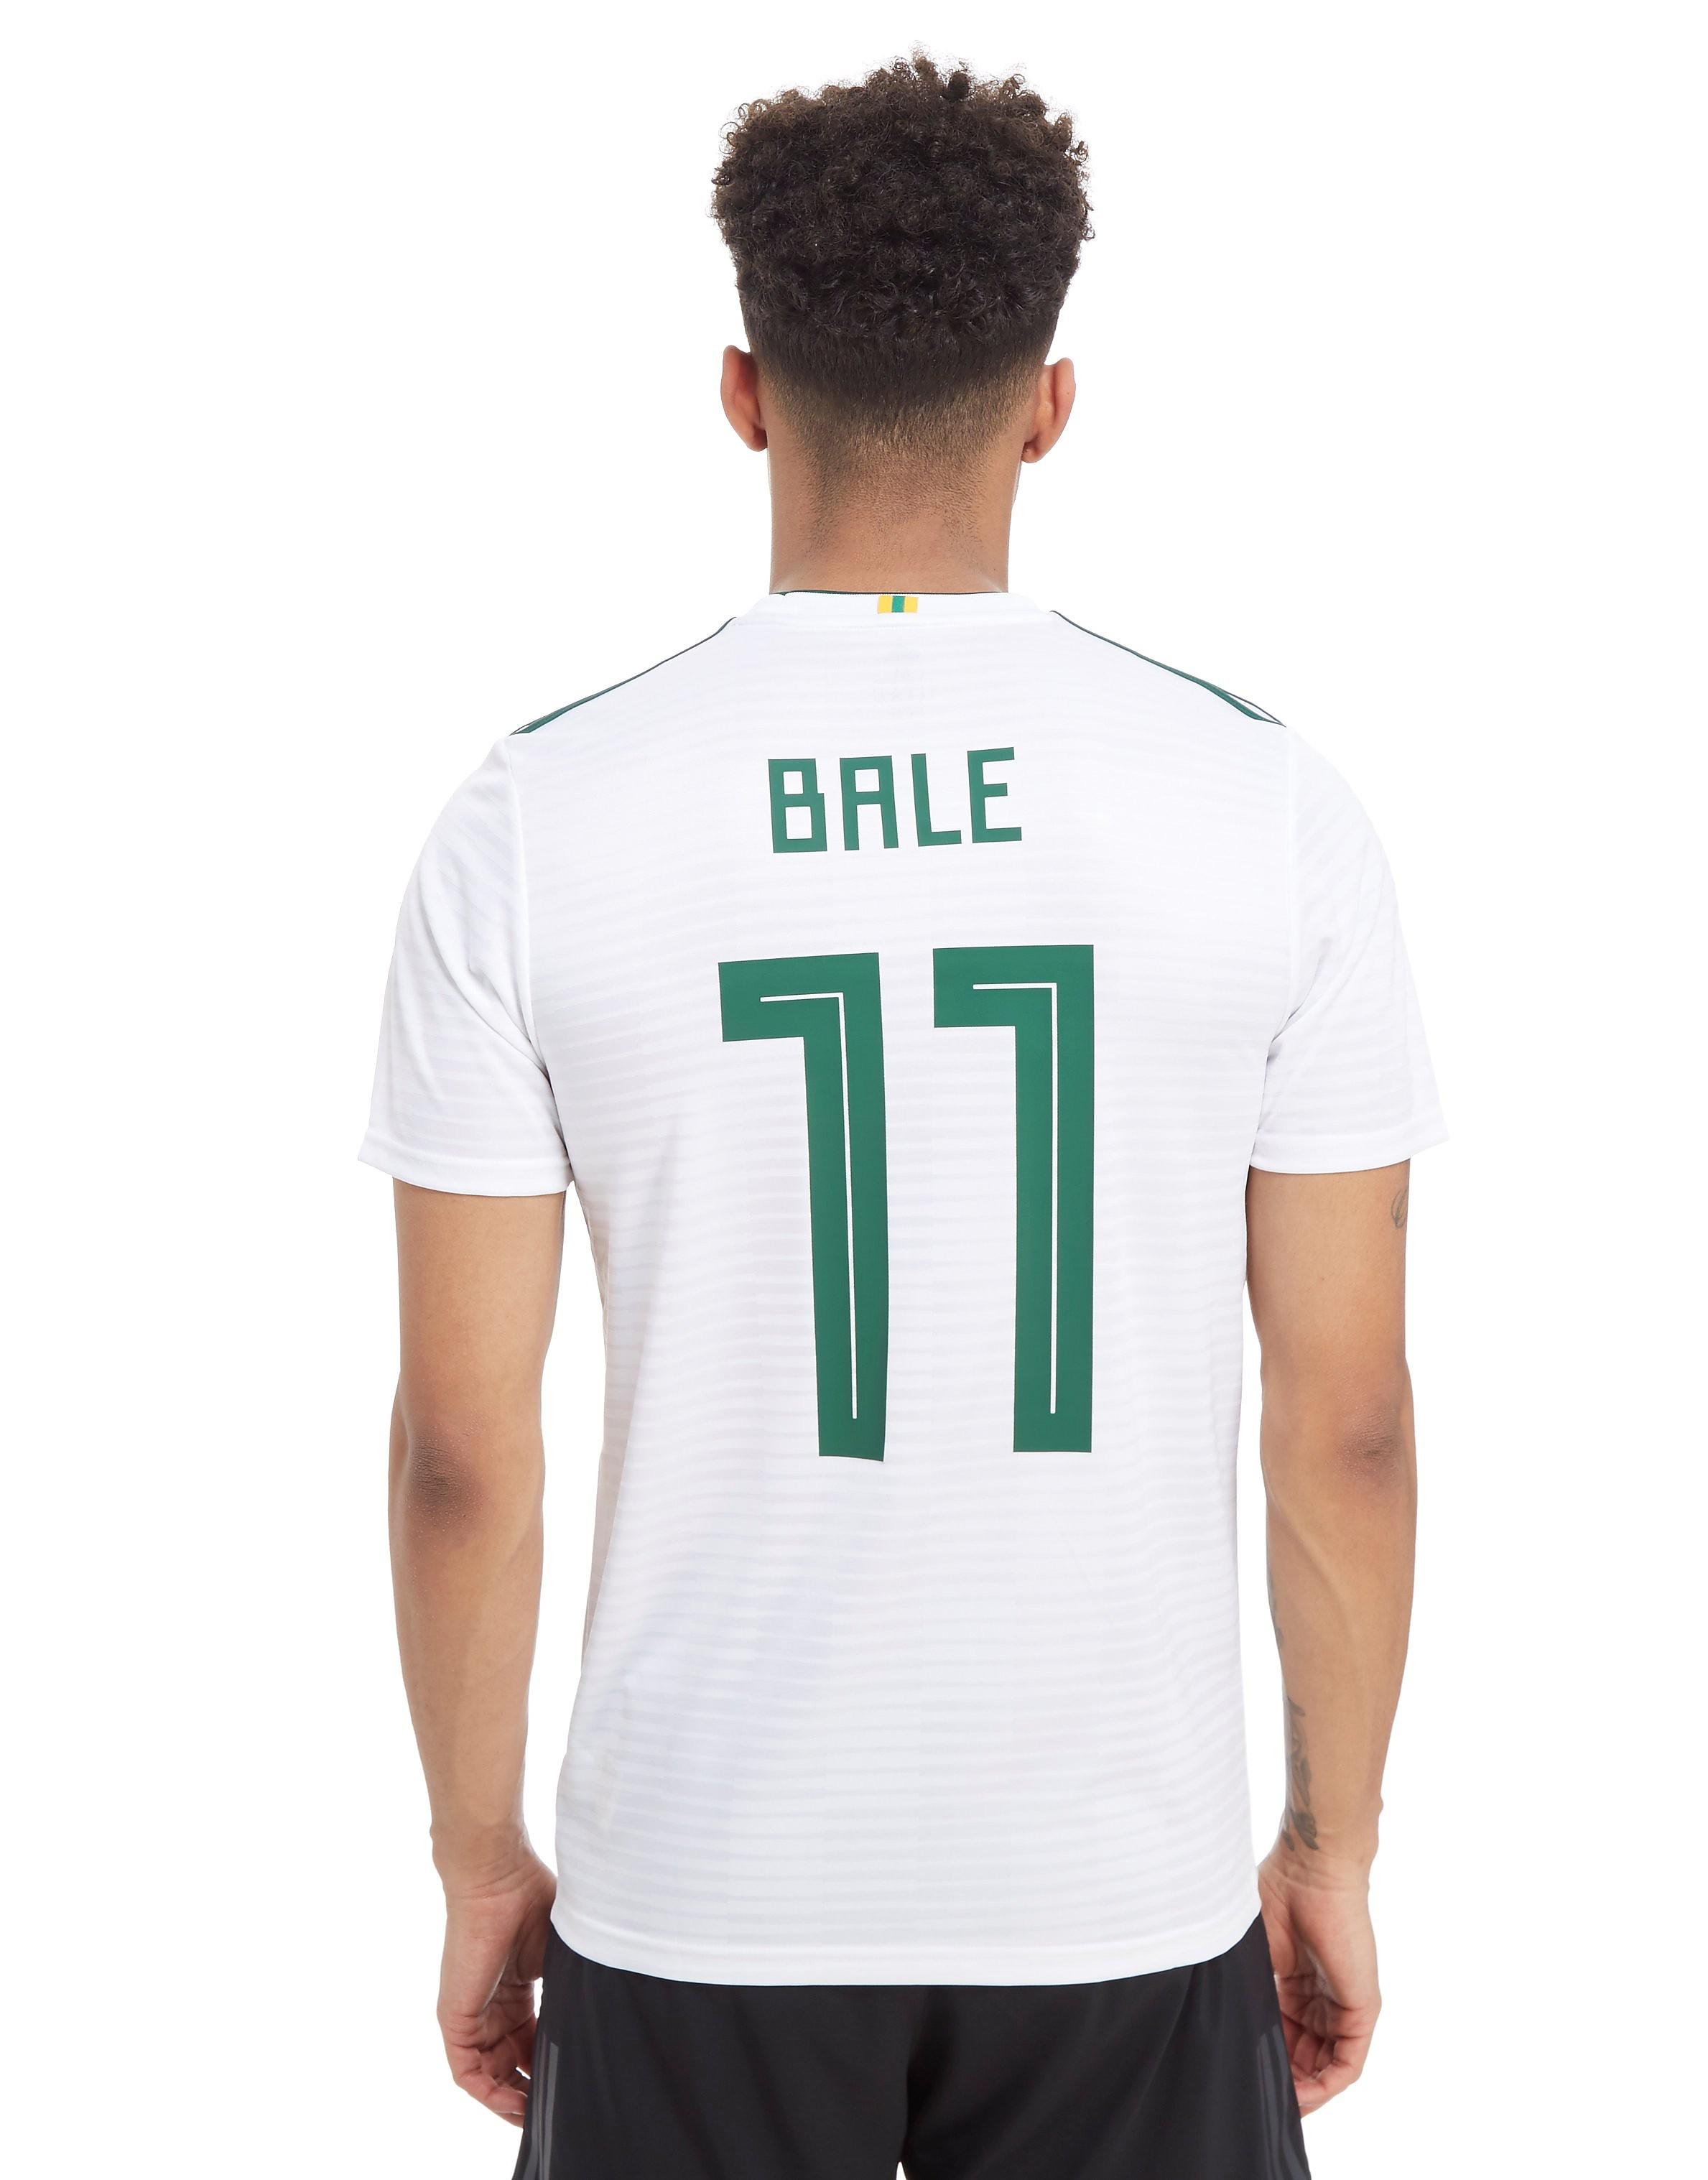 adidas Wales 2018 Away Bale #11 Shirt